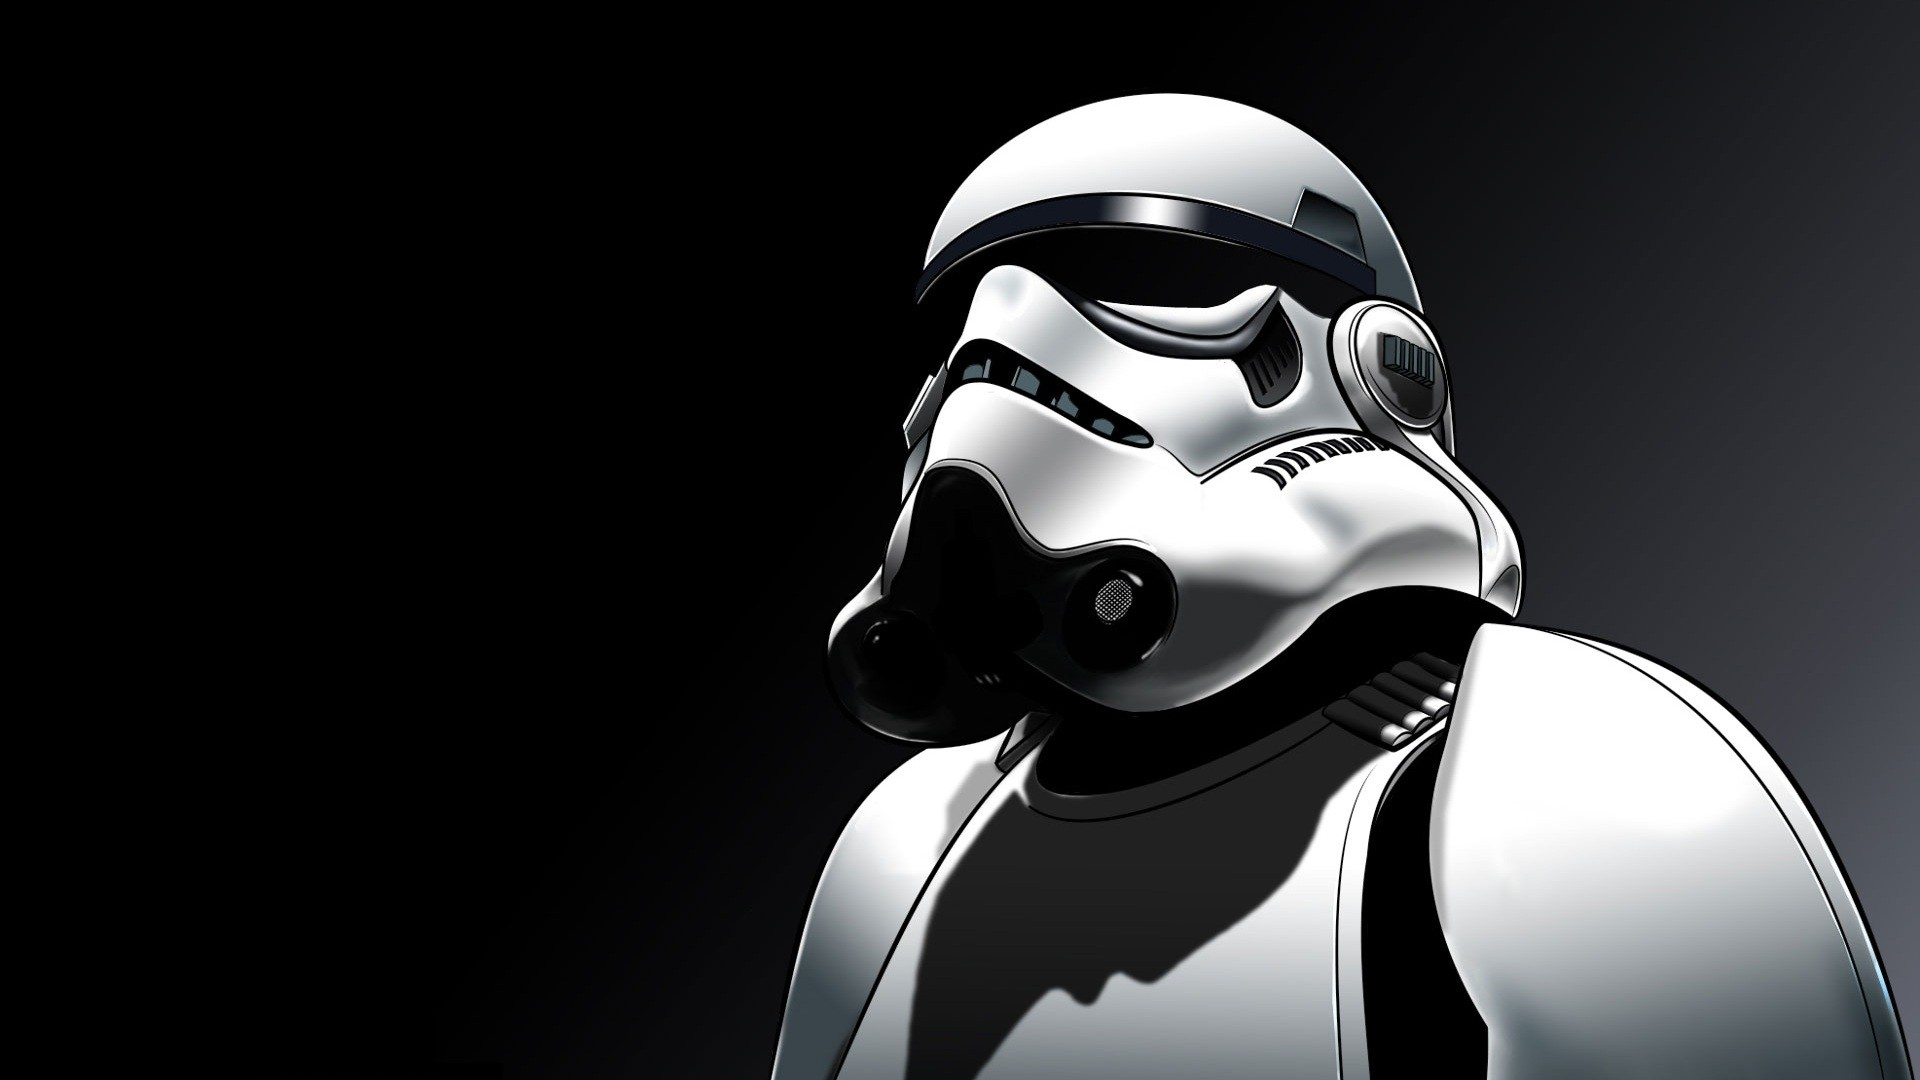 General 1920x1080 digital art Star Wars stormtrooper black white shadow